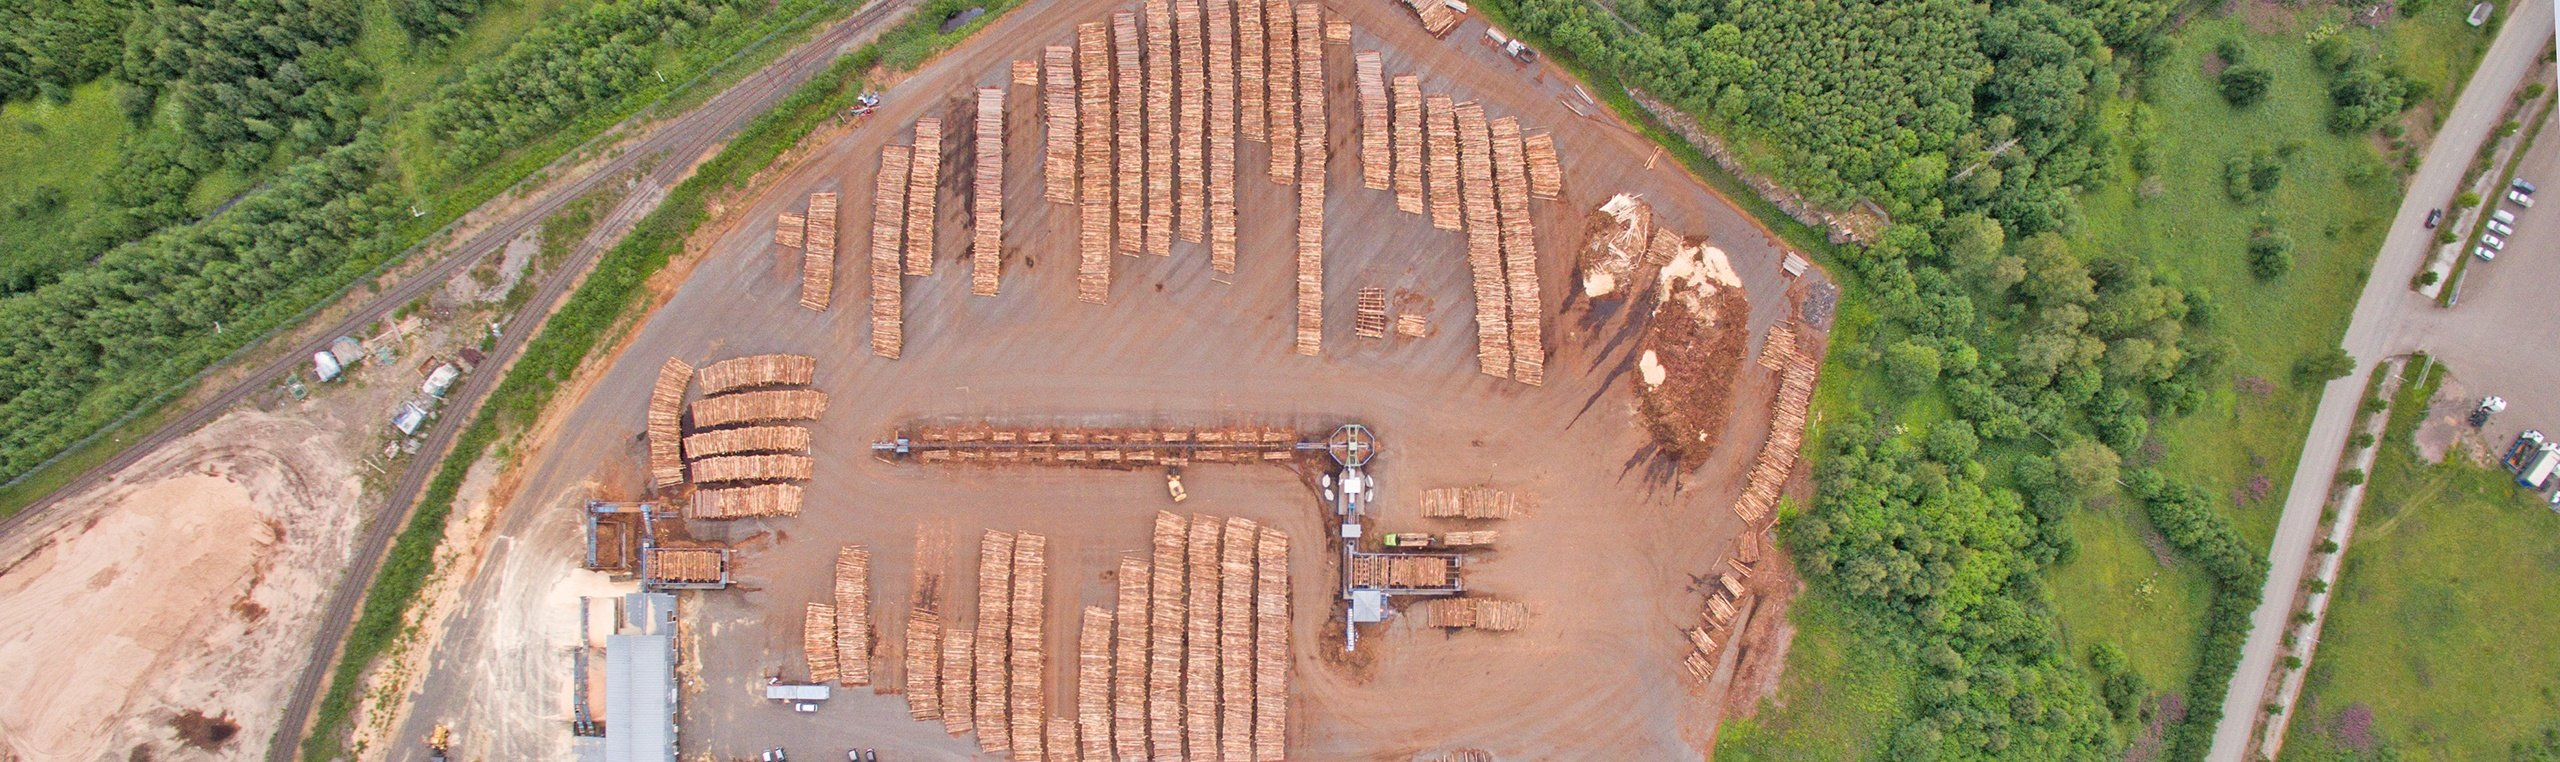 Finnos - Sawmill industry solutions